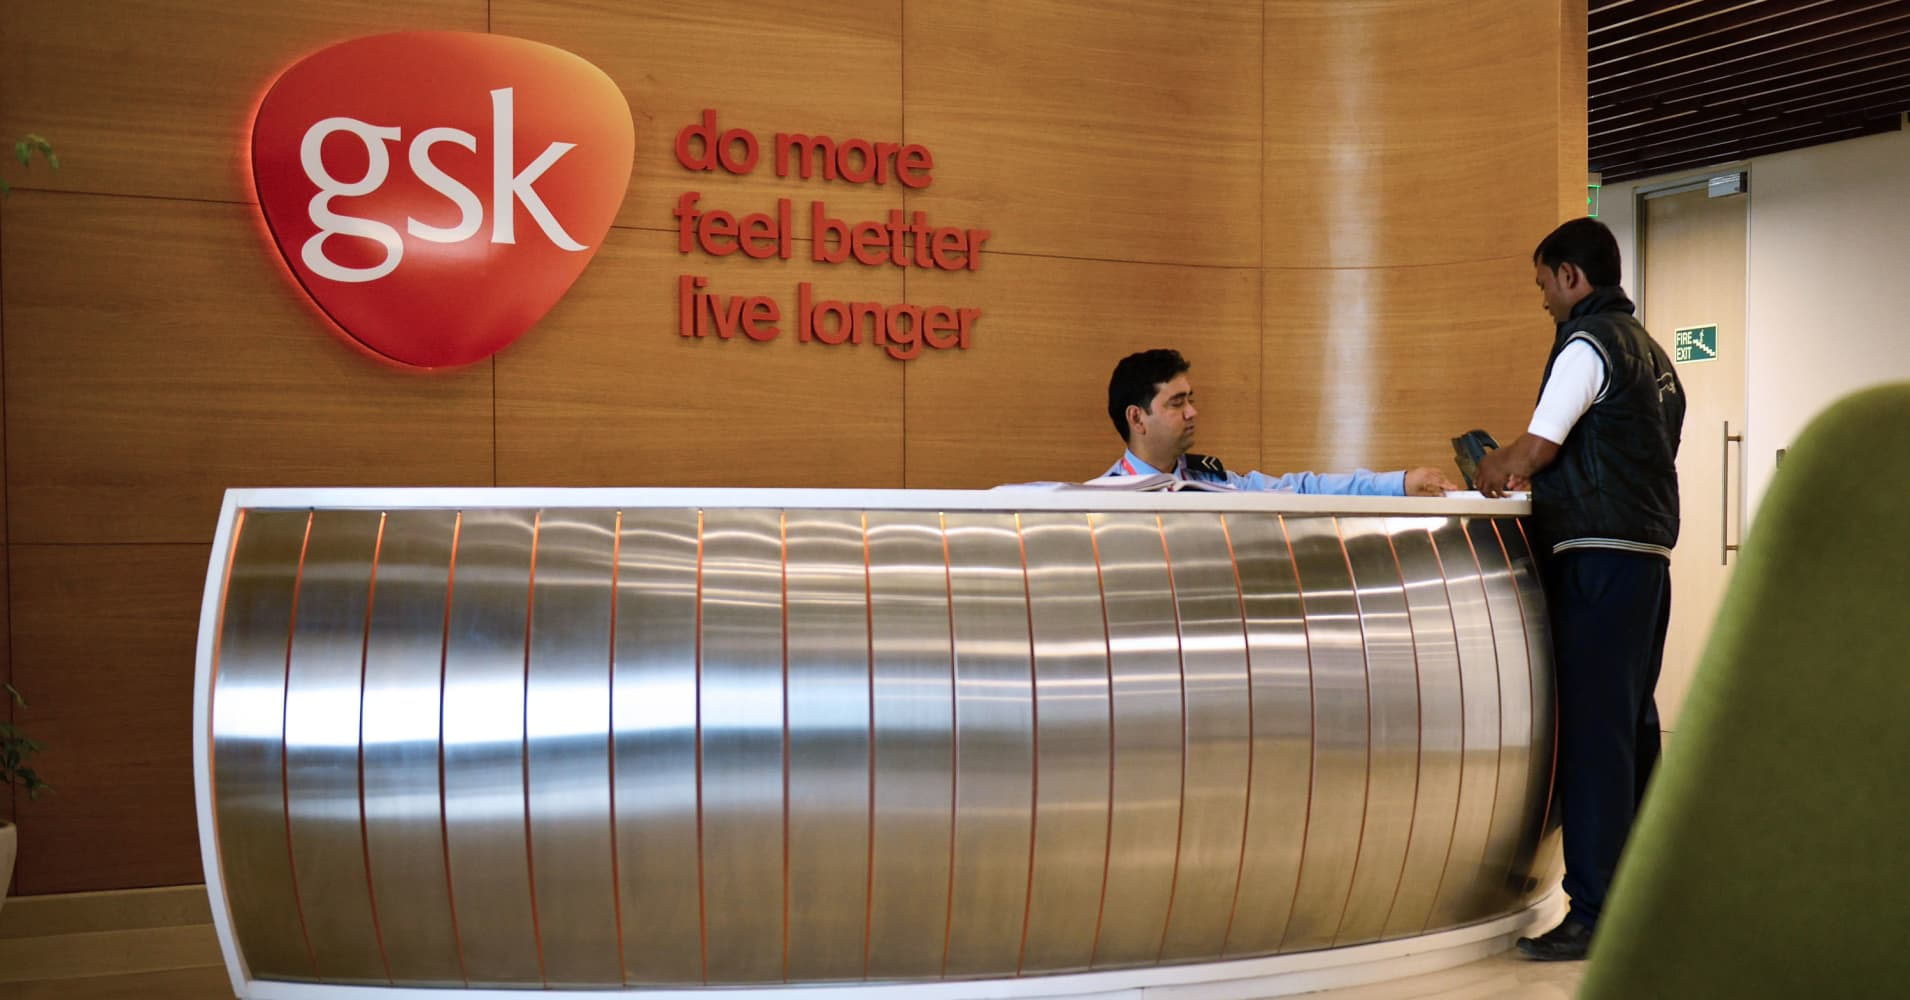 cnbc.com - Nestle, Unilever, Coke make bids in $4 billion-plus GSK India sale